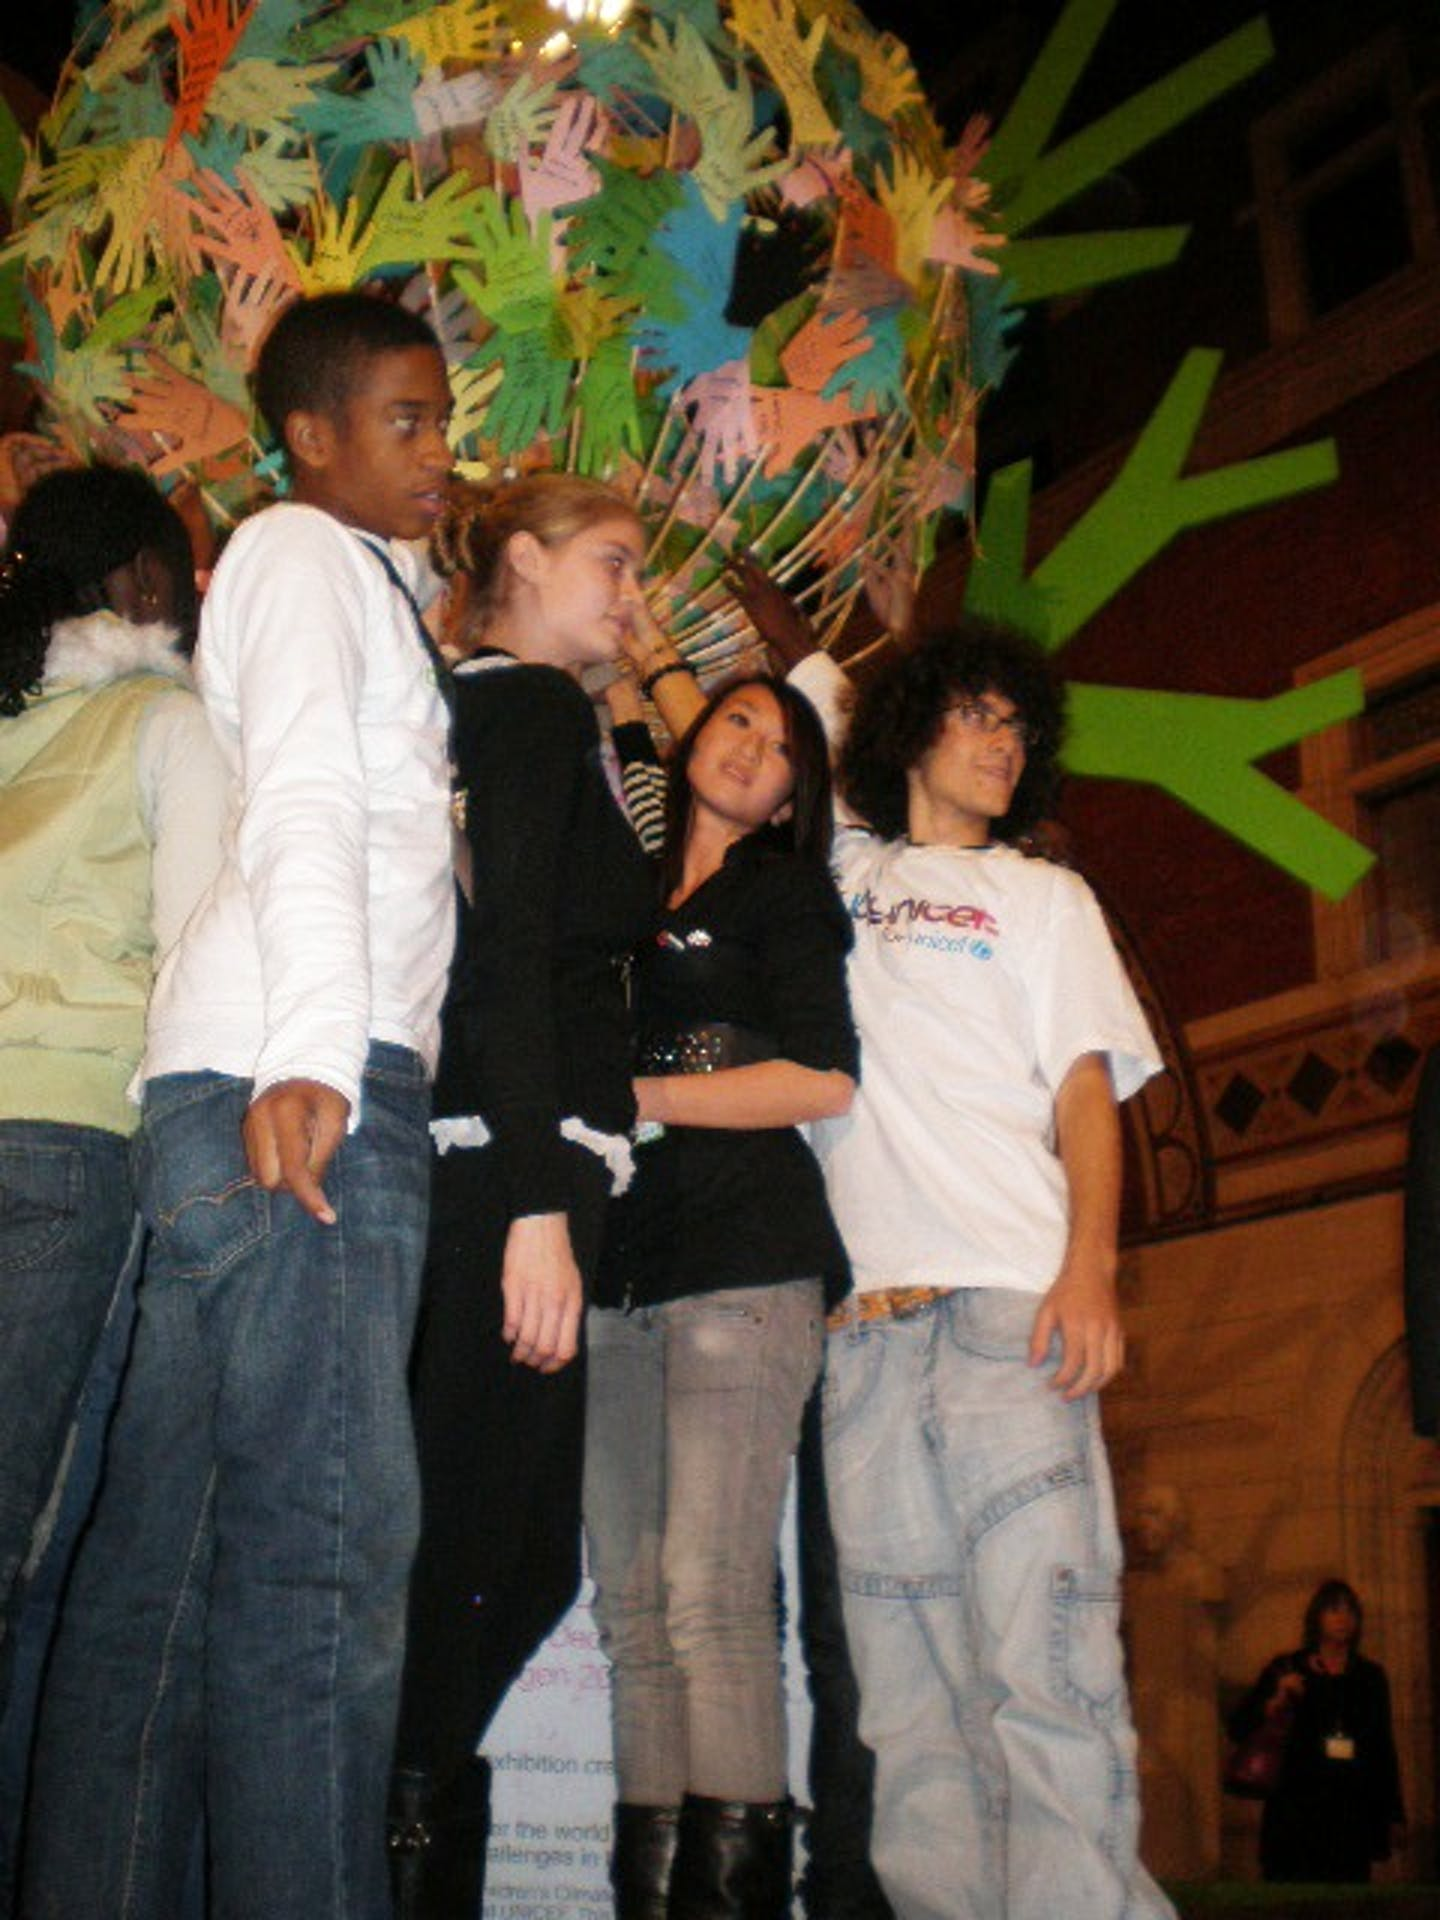 YOUNICEF Ambassadors